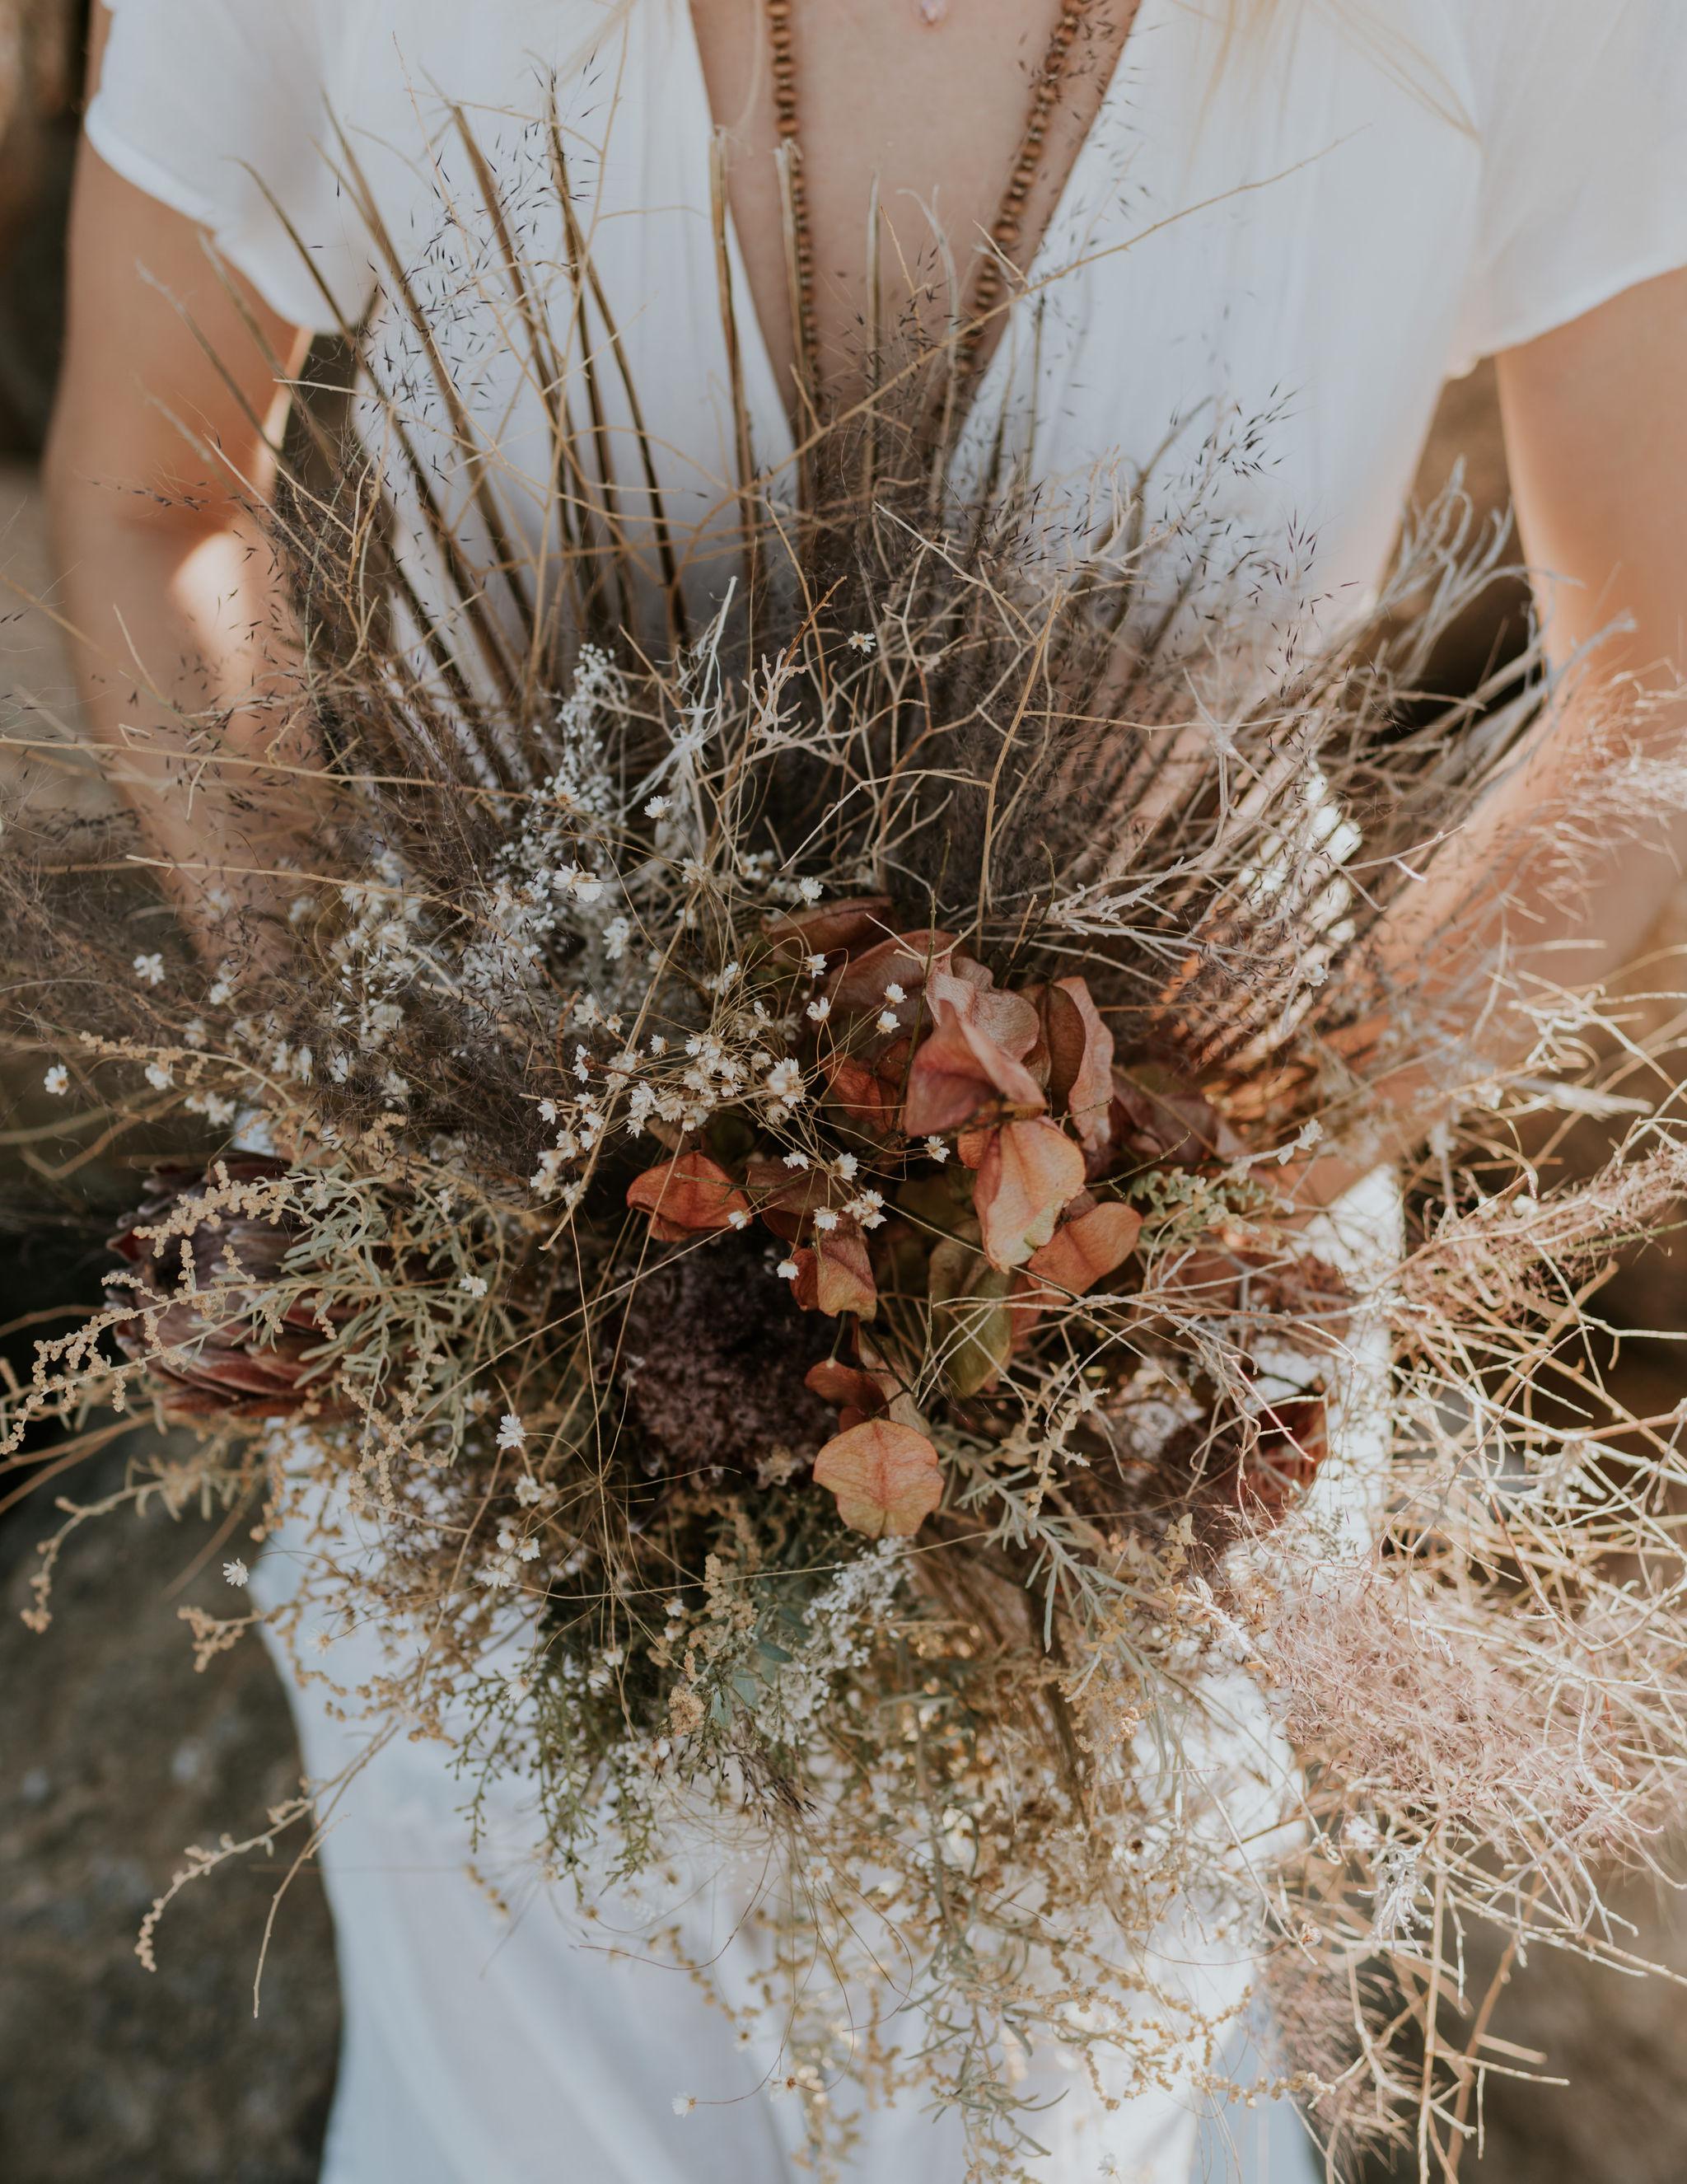 palmspringsstyledshootcarrierogersphotography.jpg